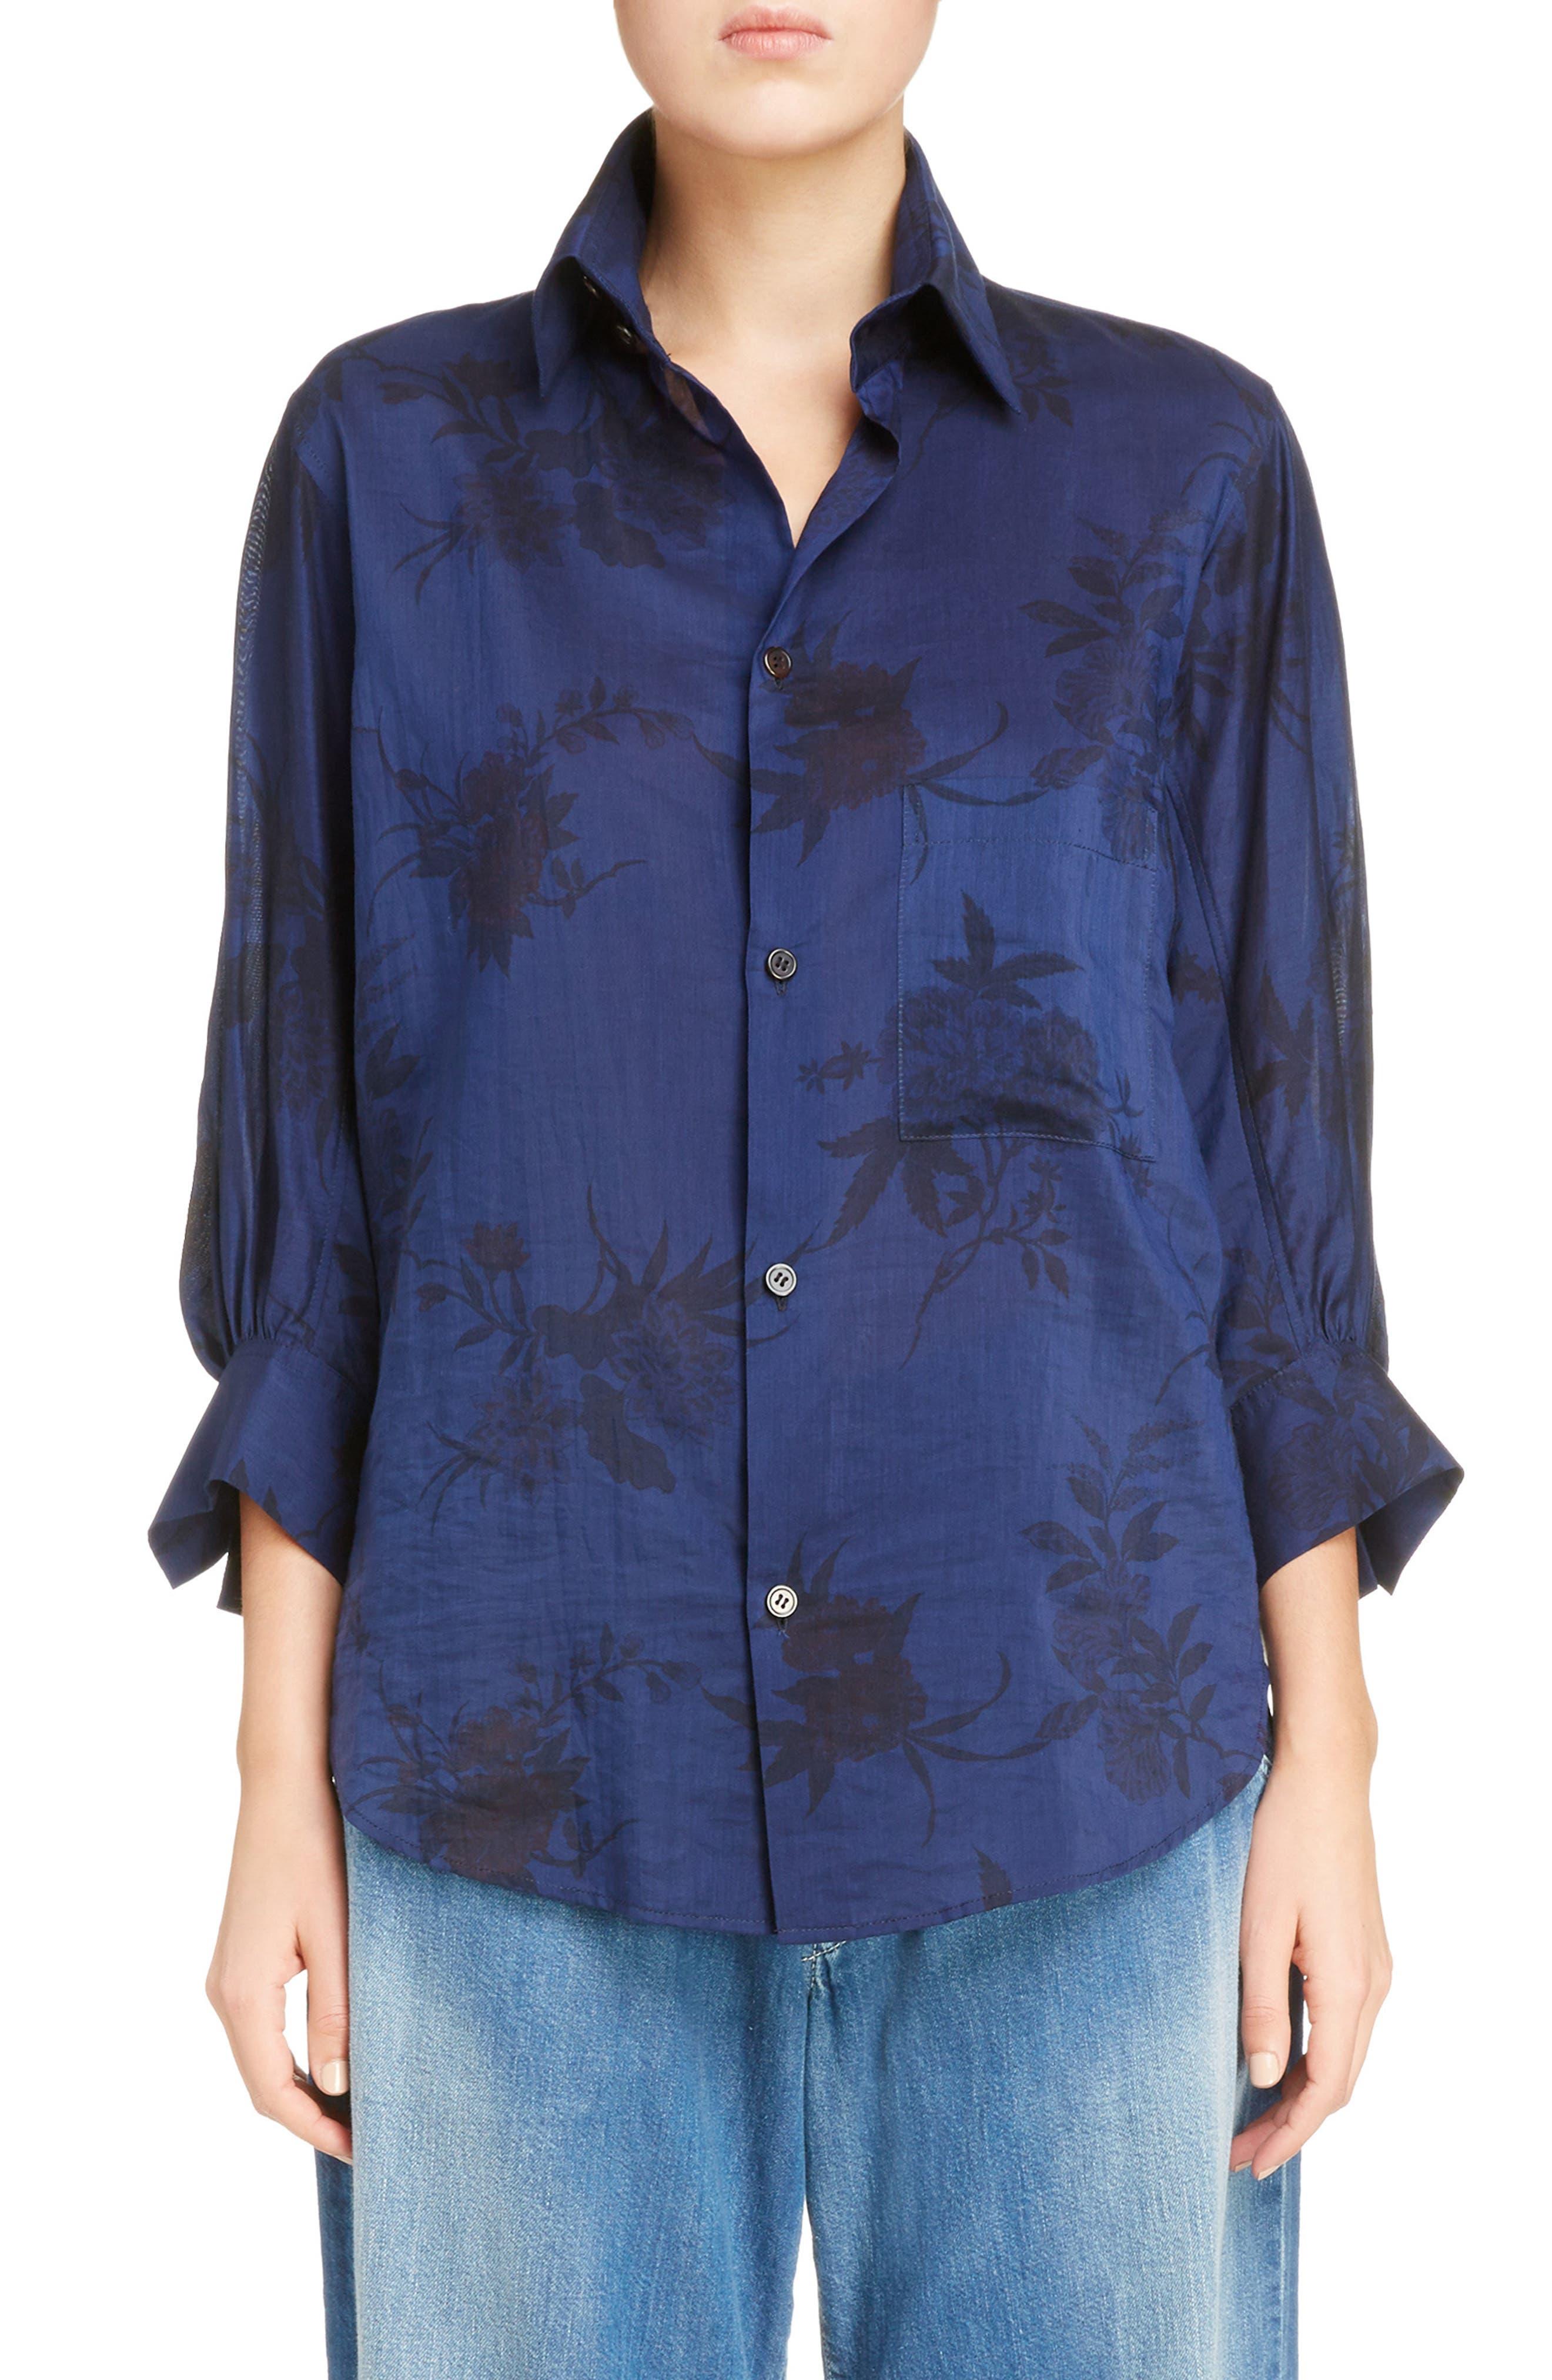 Y's by Yohji Yamamoto Floral Print Shirt